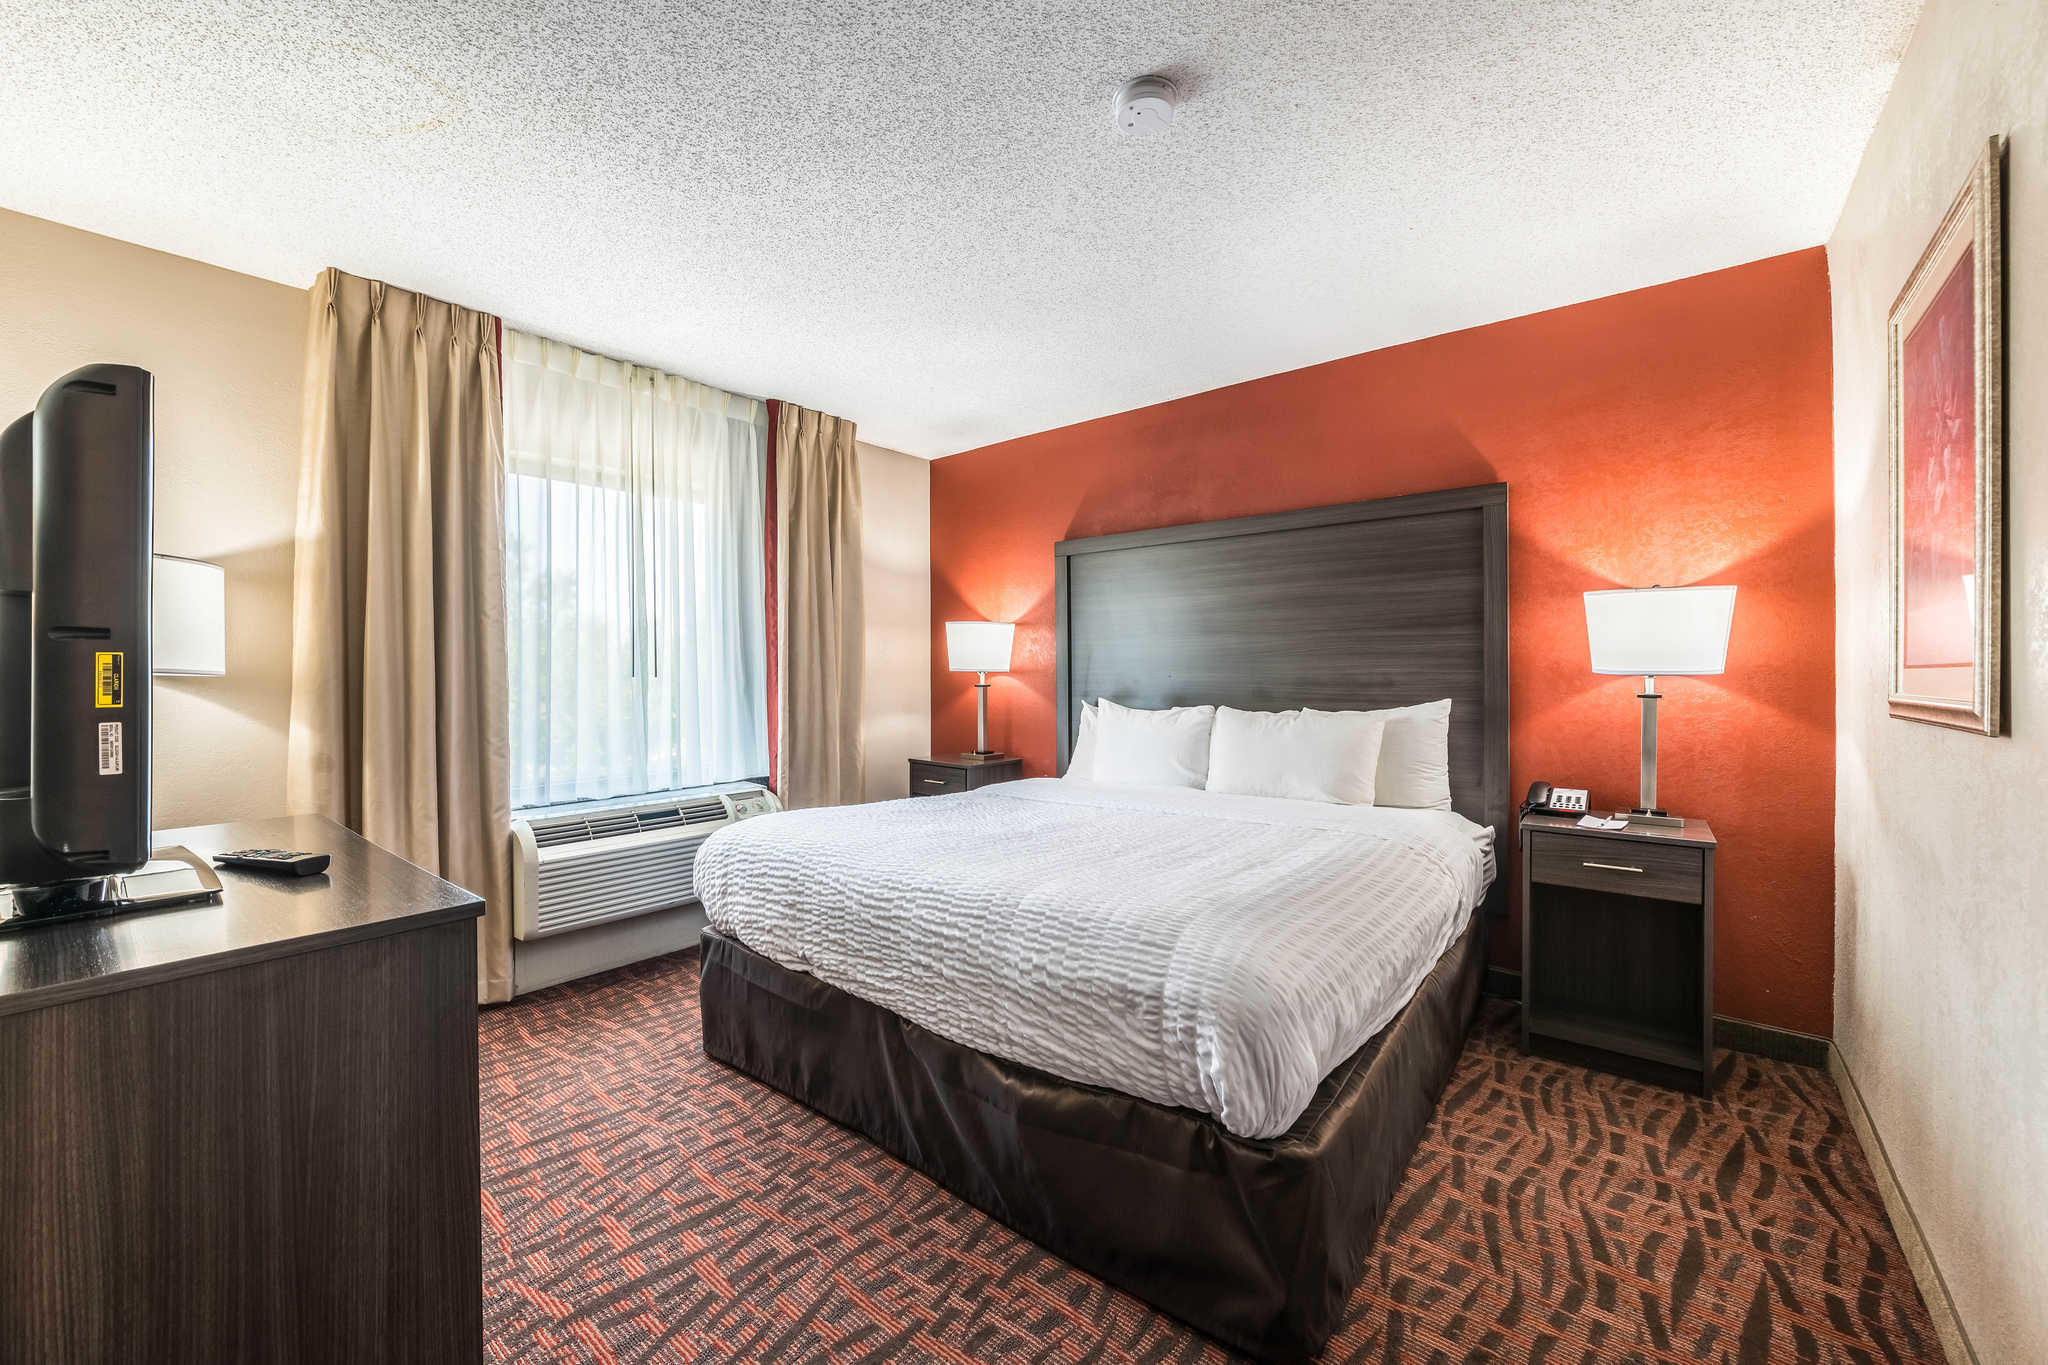 Clarion Inn & Suites image 34